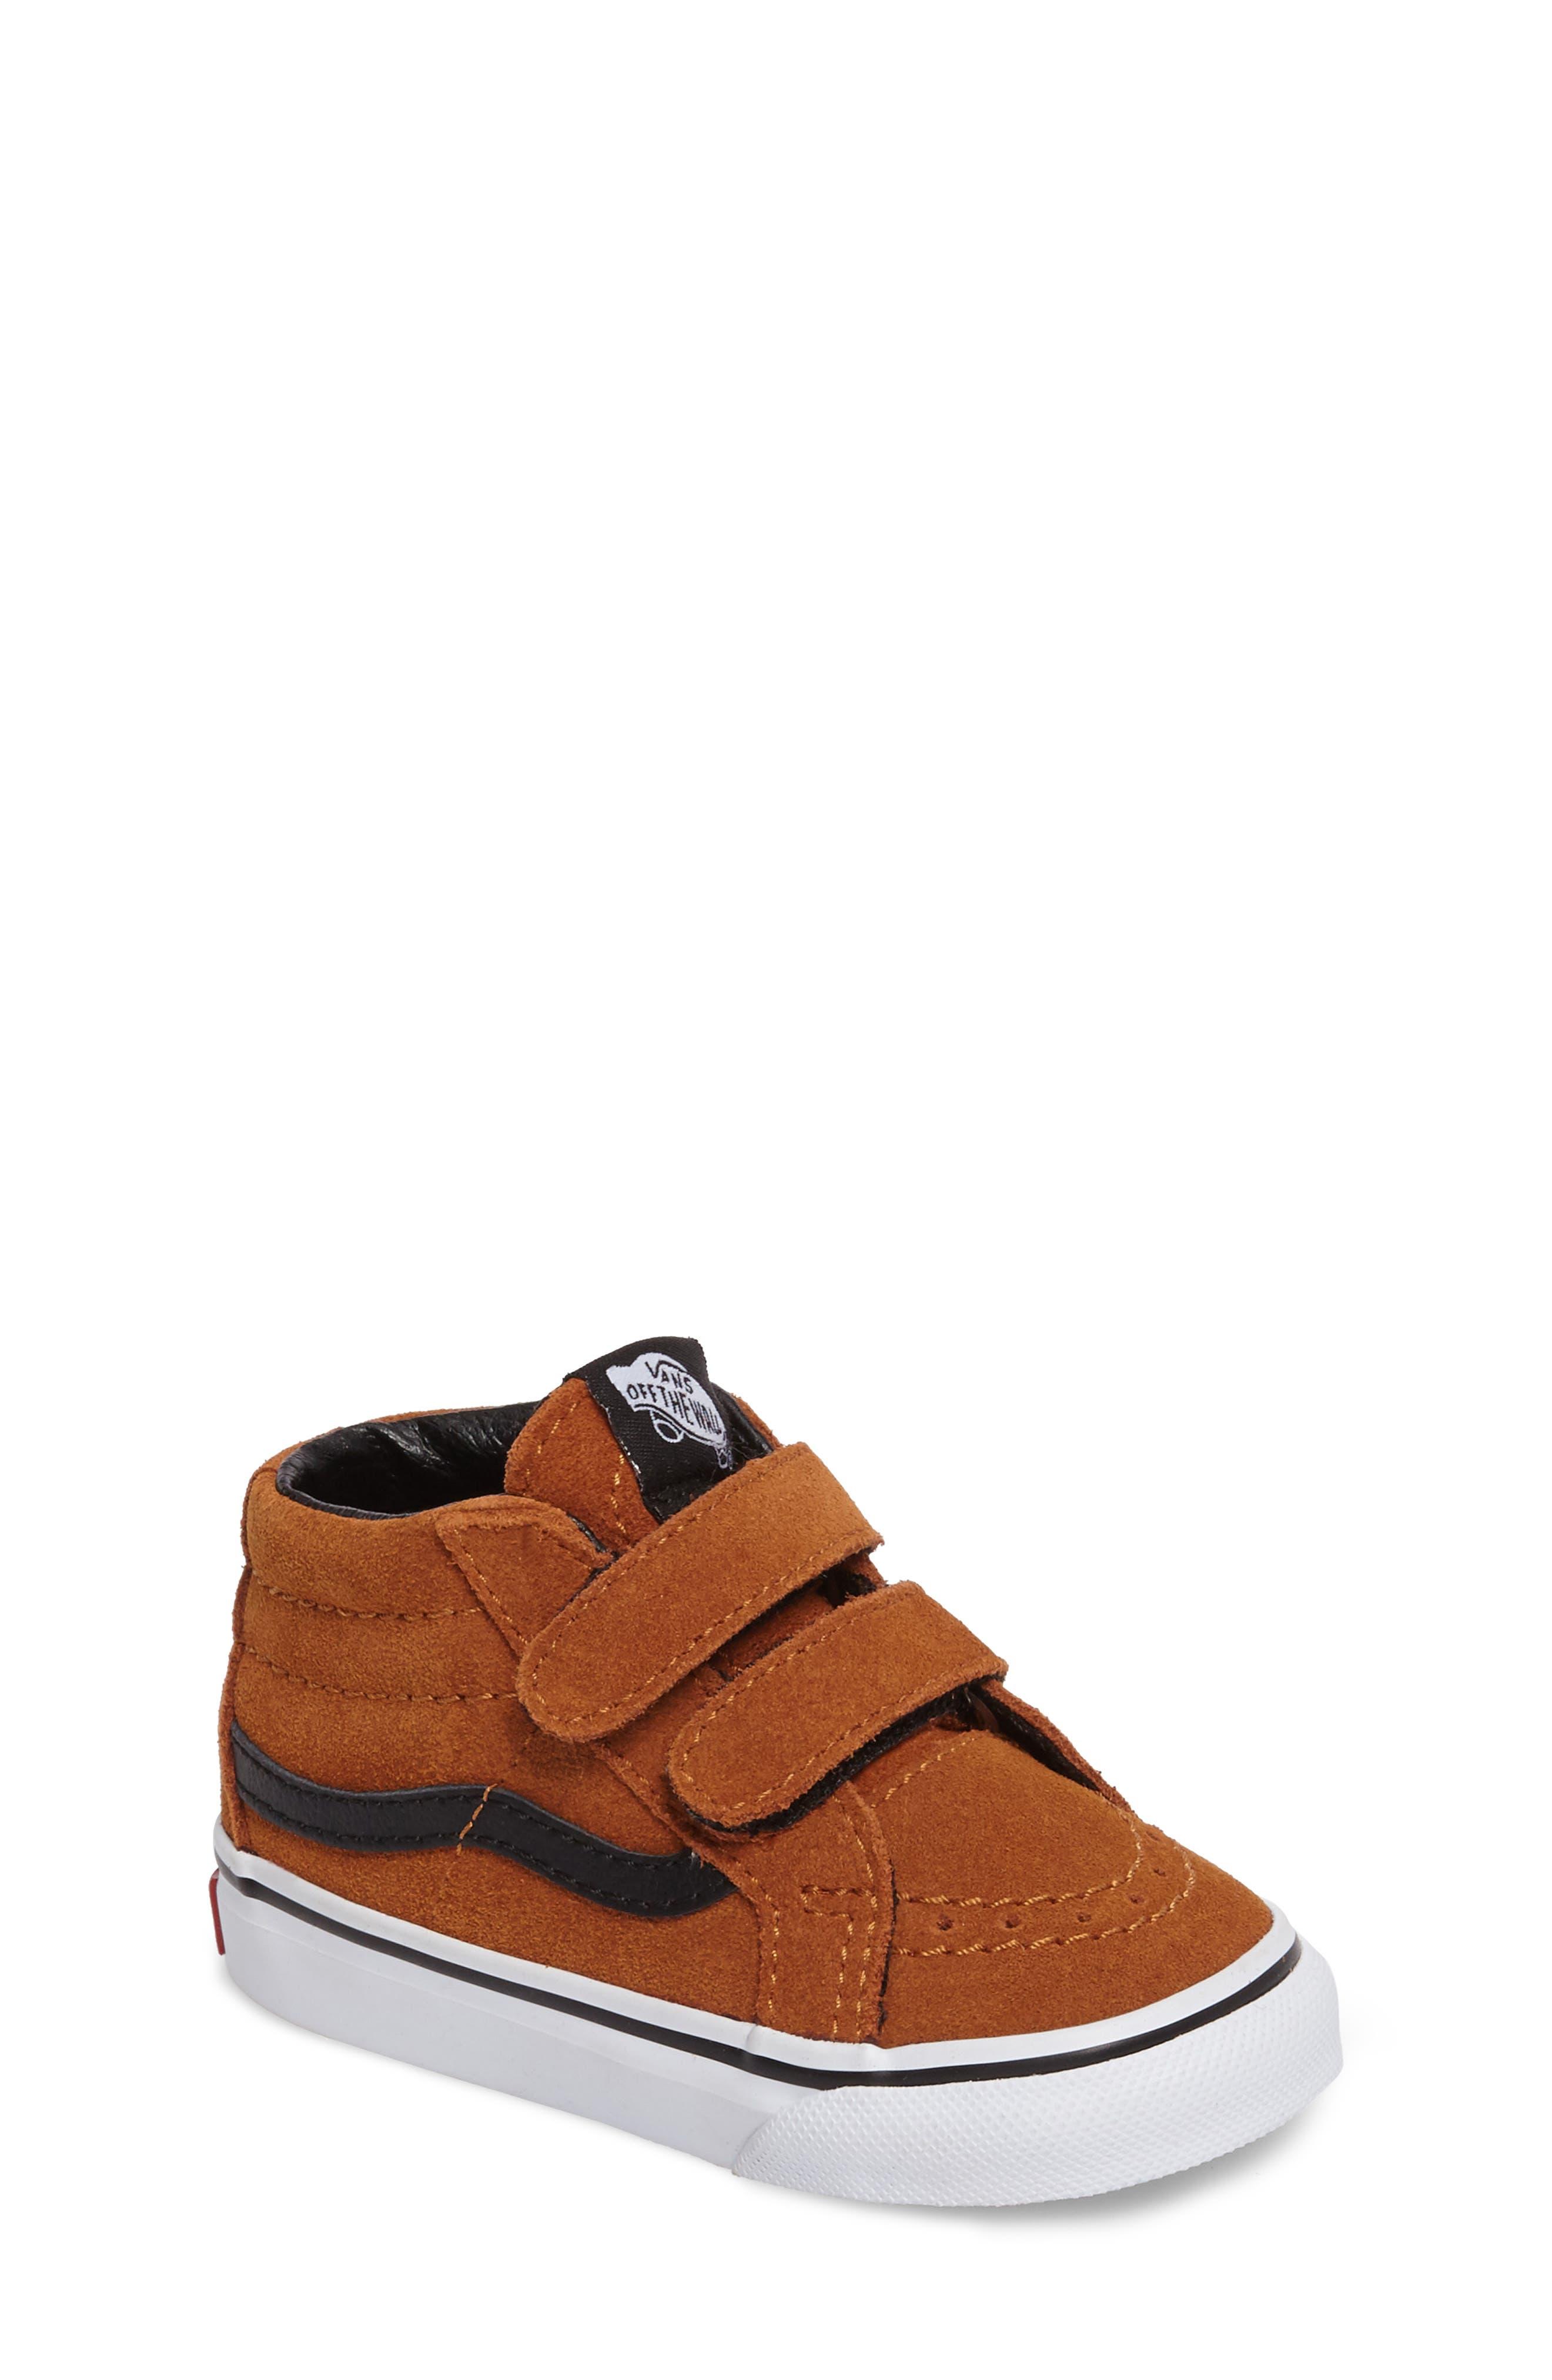 Main Image - Vans SK8-Mid Reissue Sneaker (Baby, Walker, Toddler, Little Kid & Big Kid)